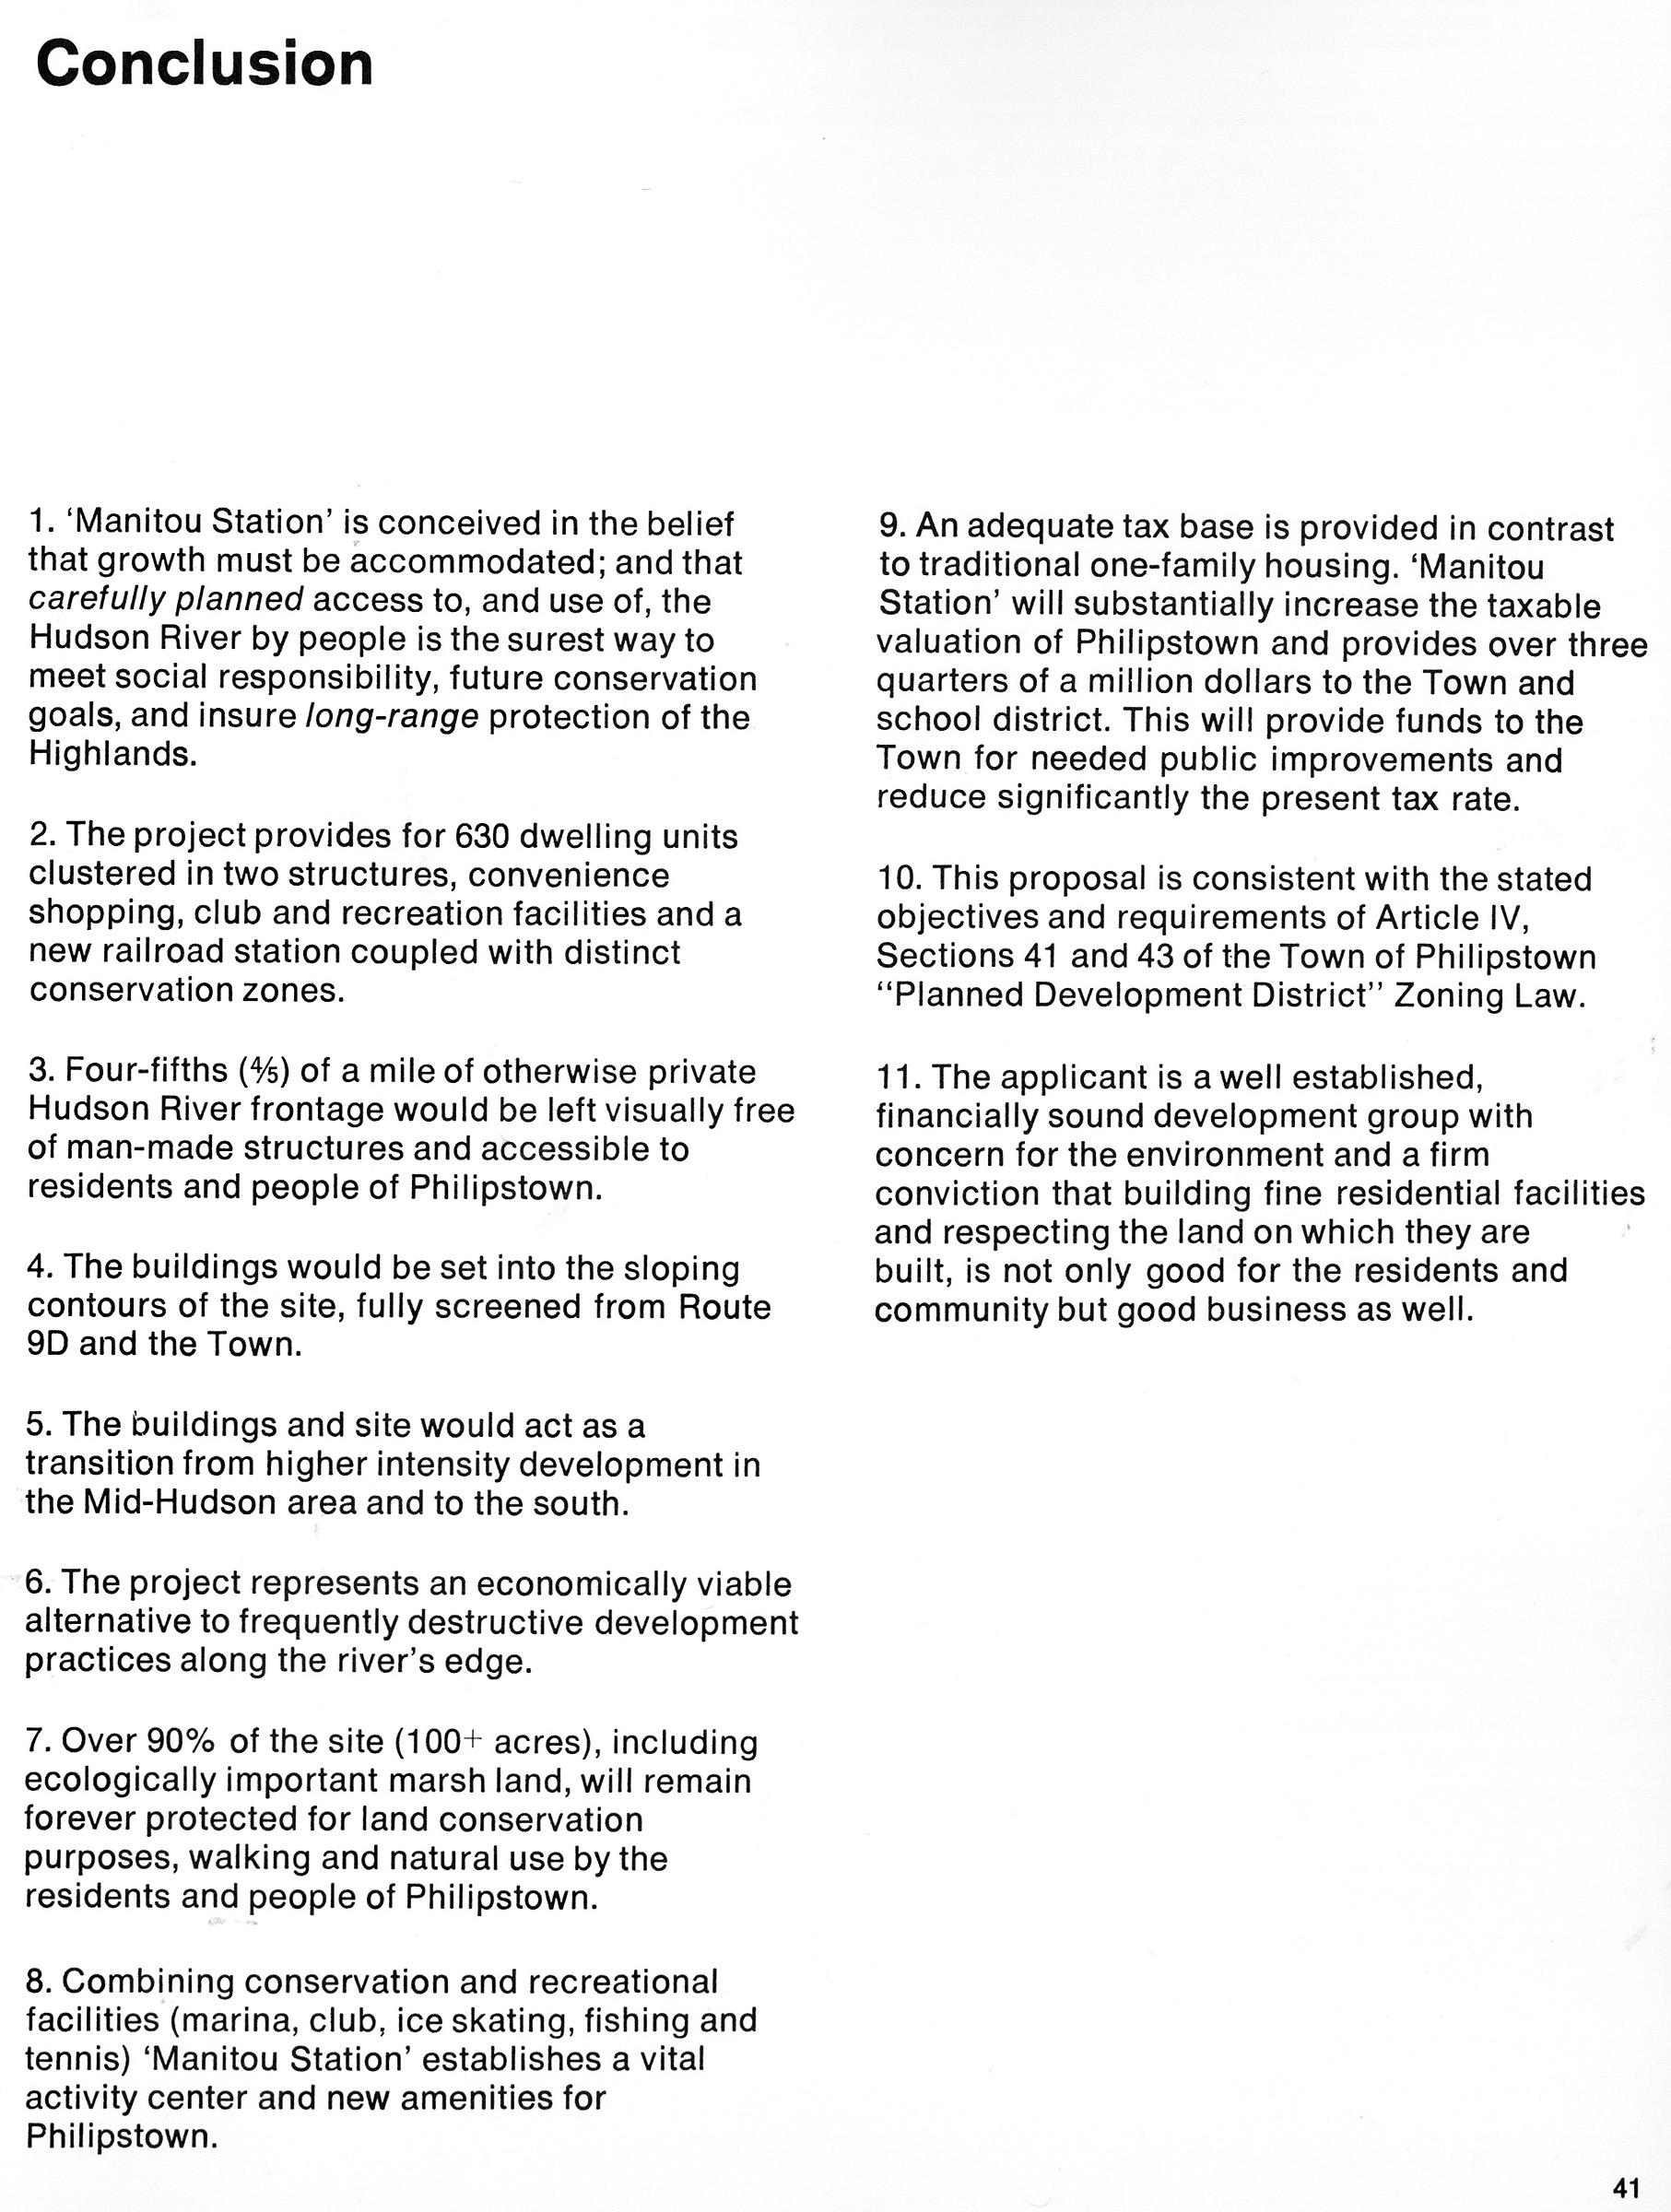 page50.jpg